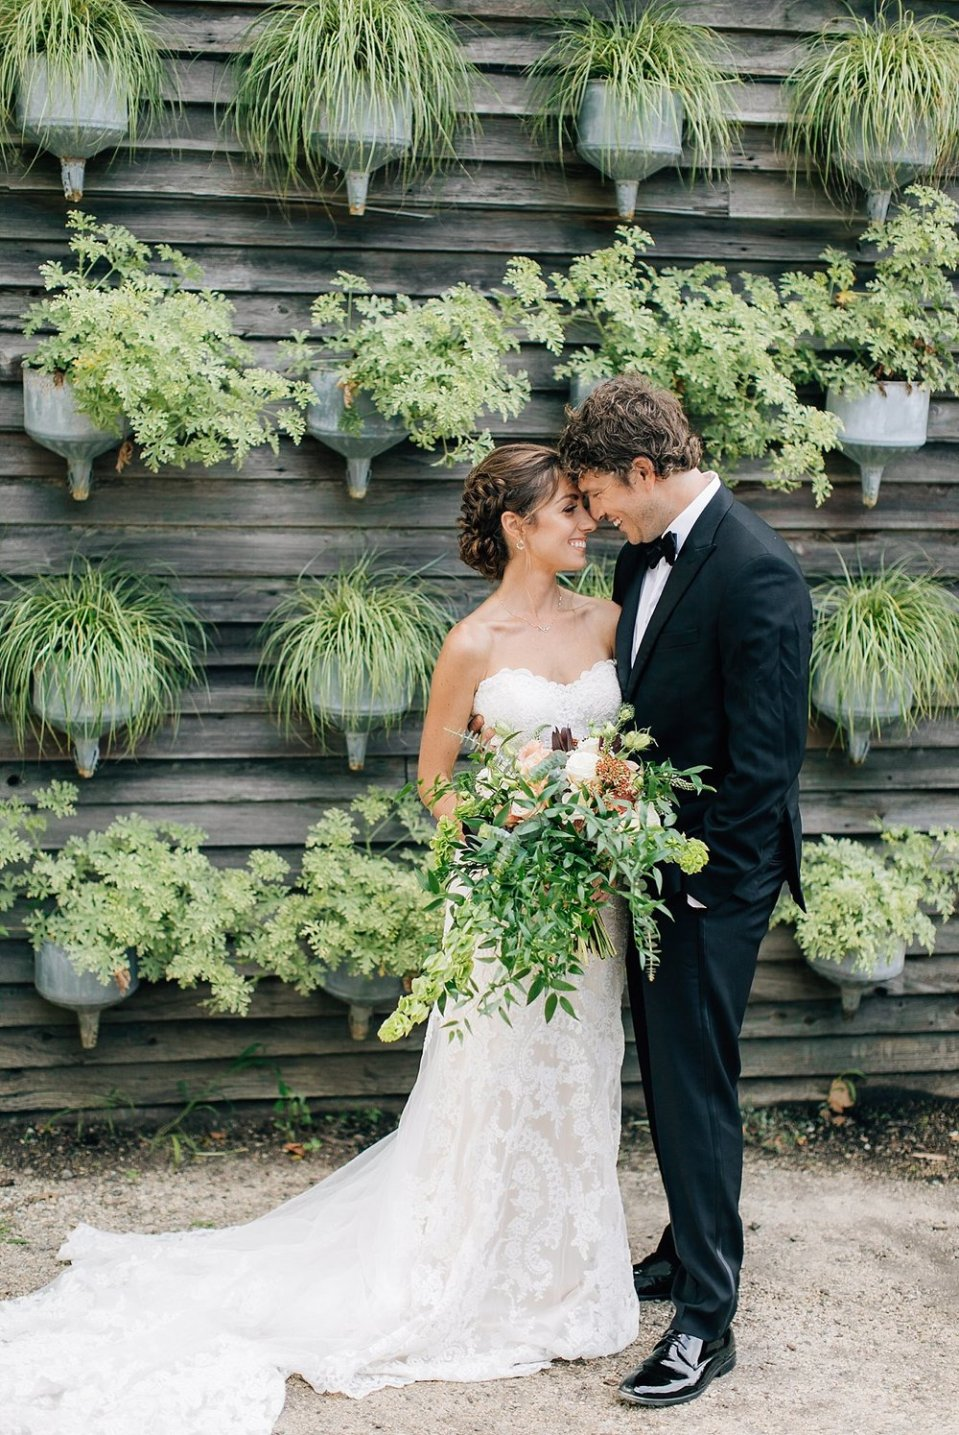 terrain gatherings glen mills pa romantic garden wedding photography magdalena studios 0019